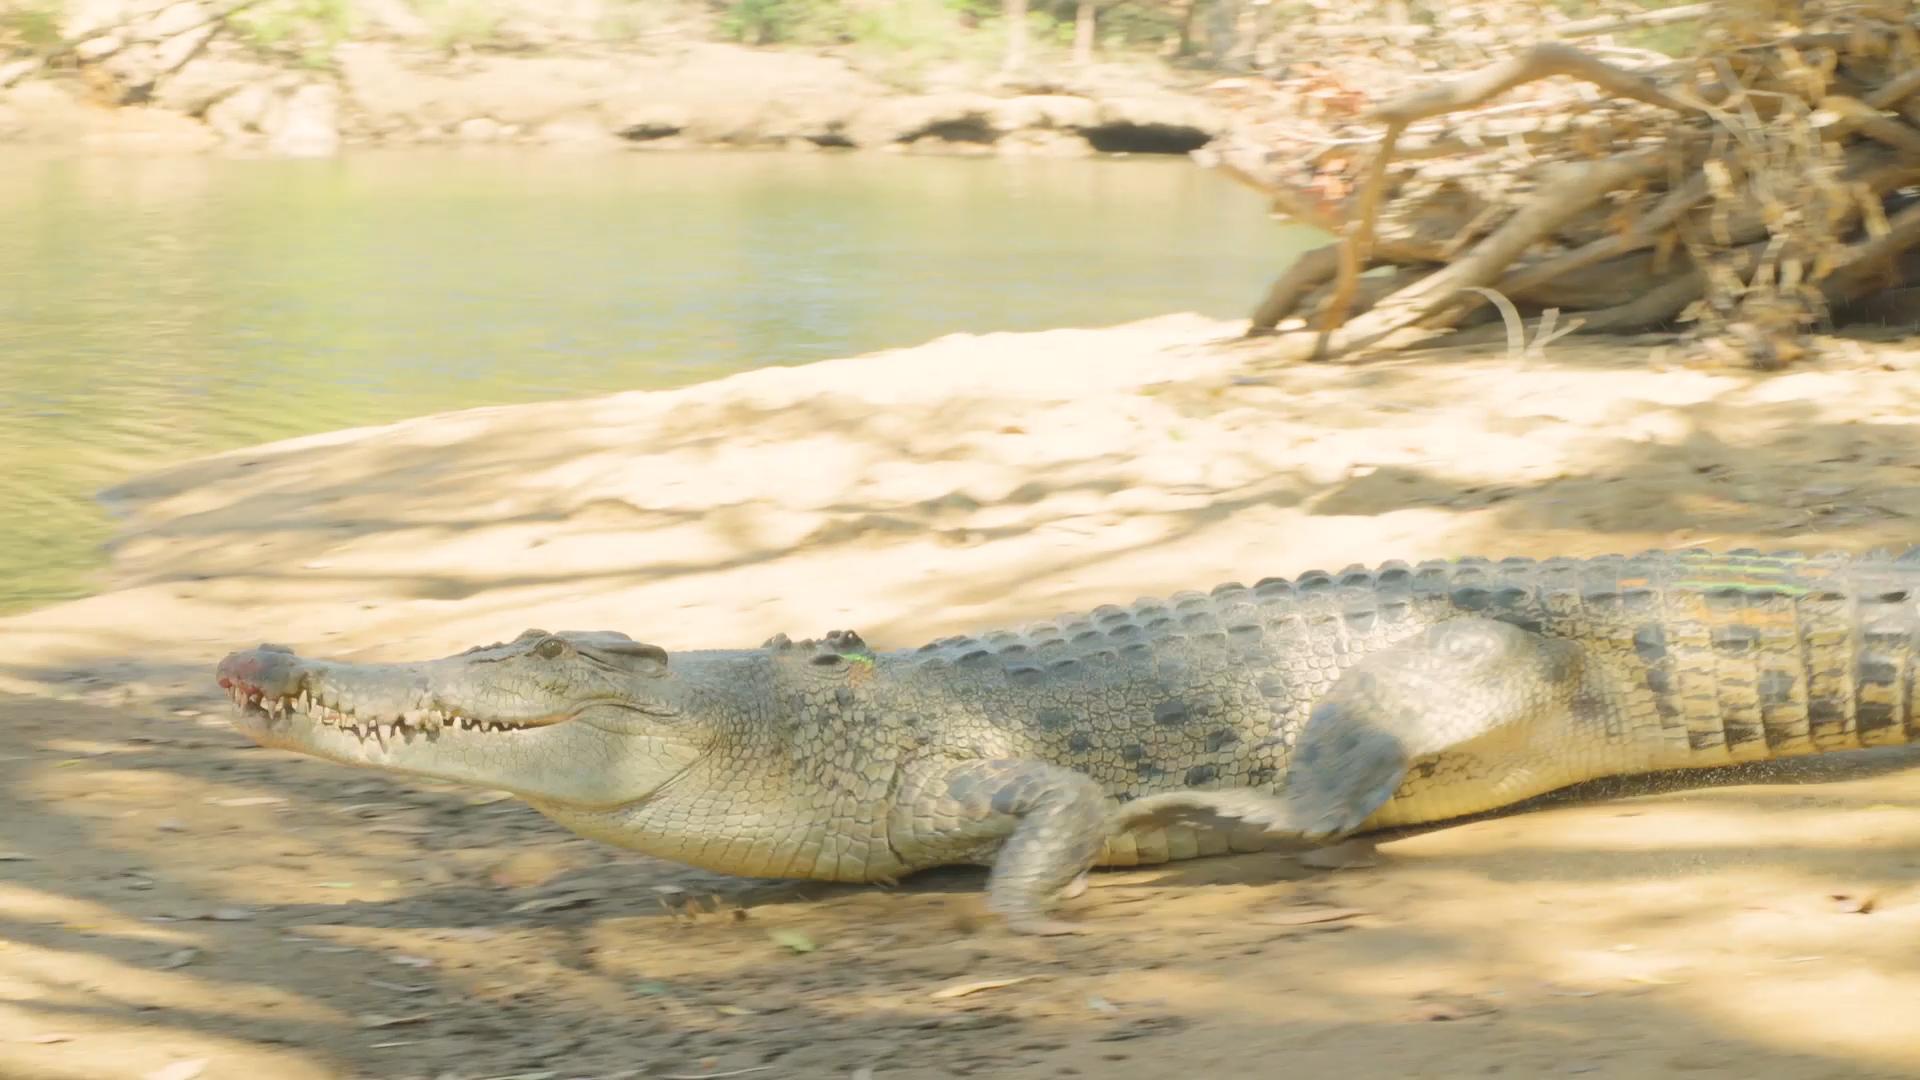 Croc Trip Video